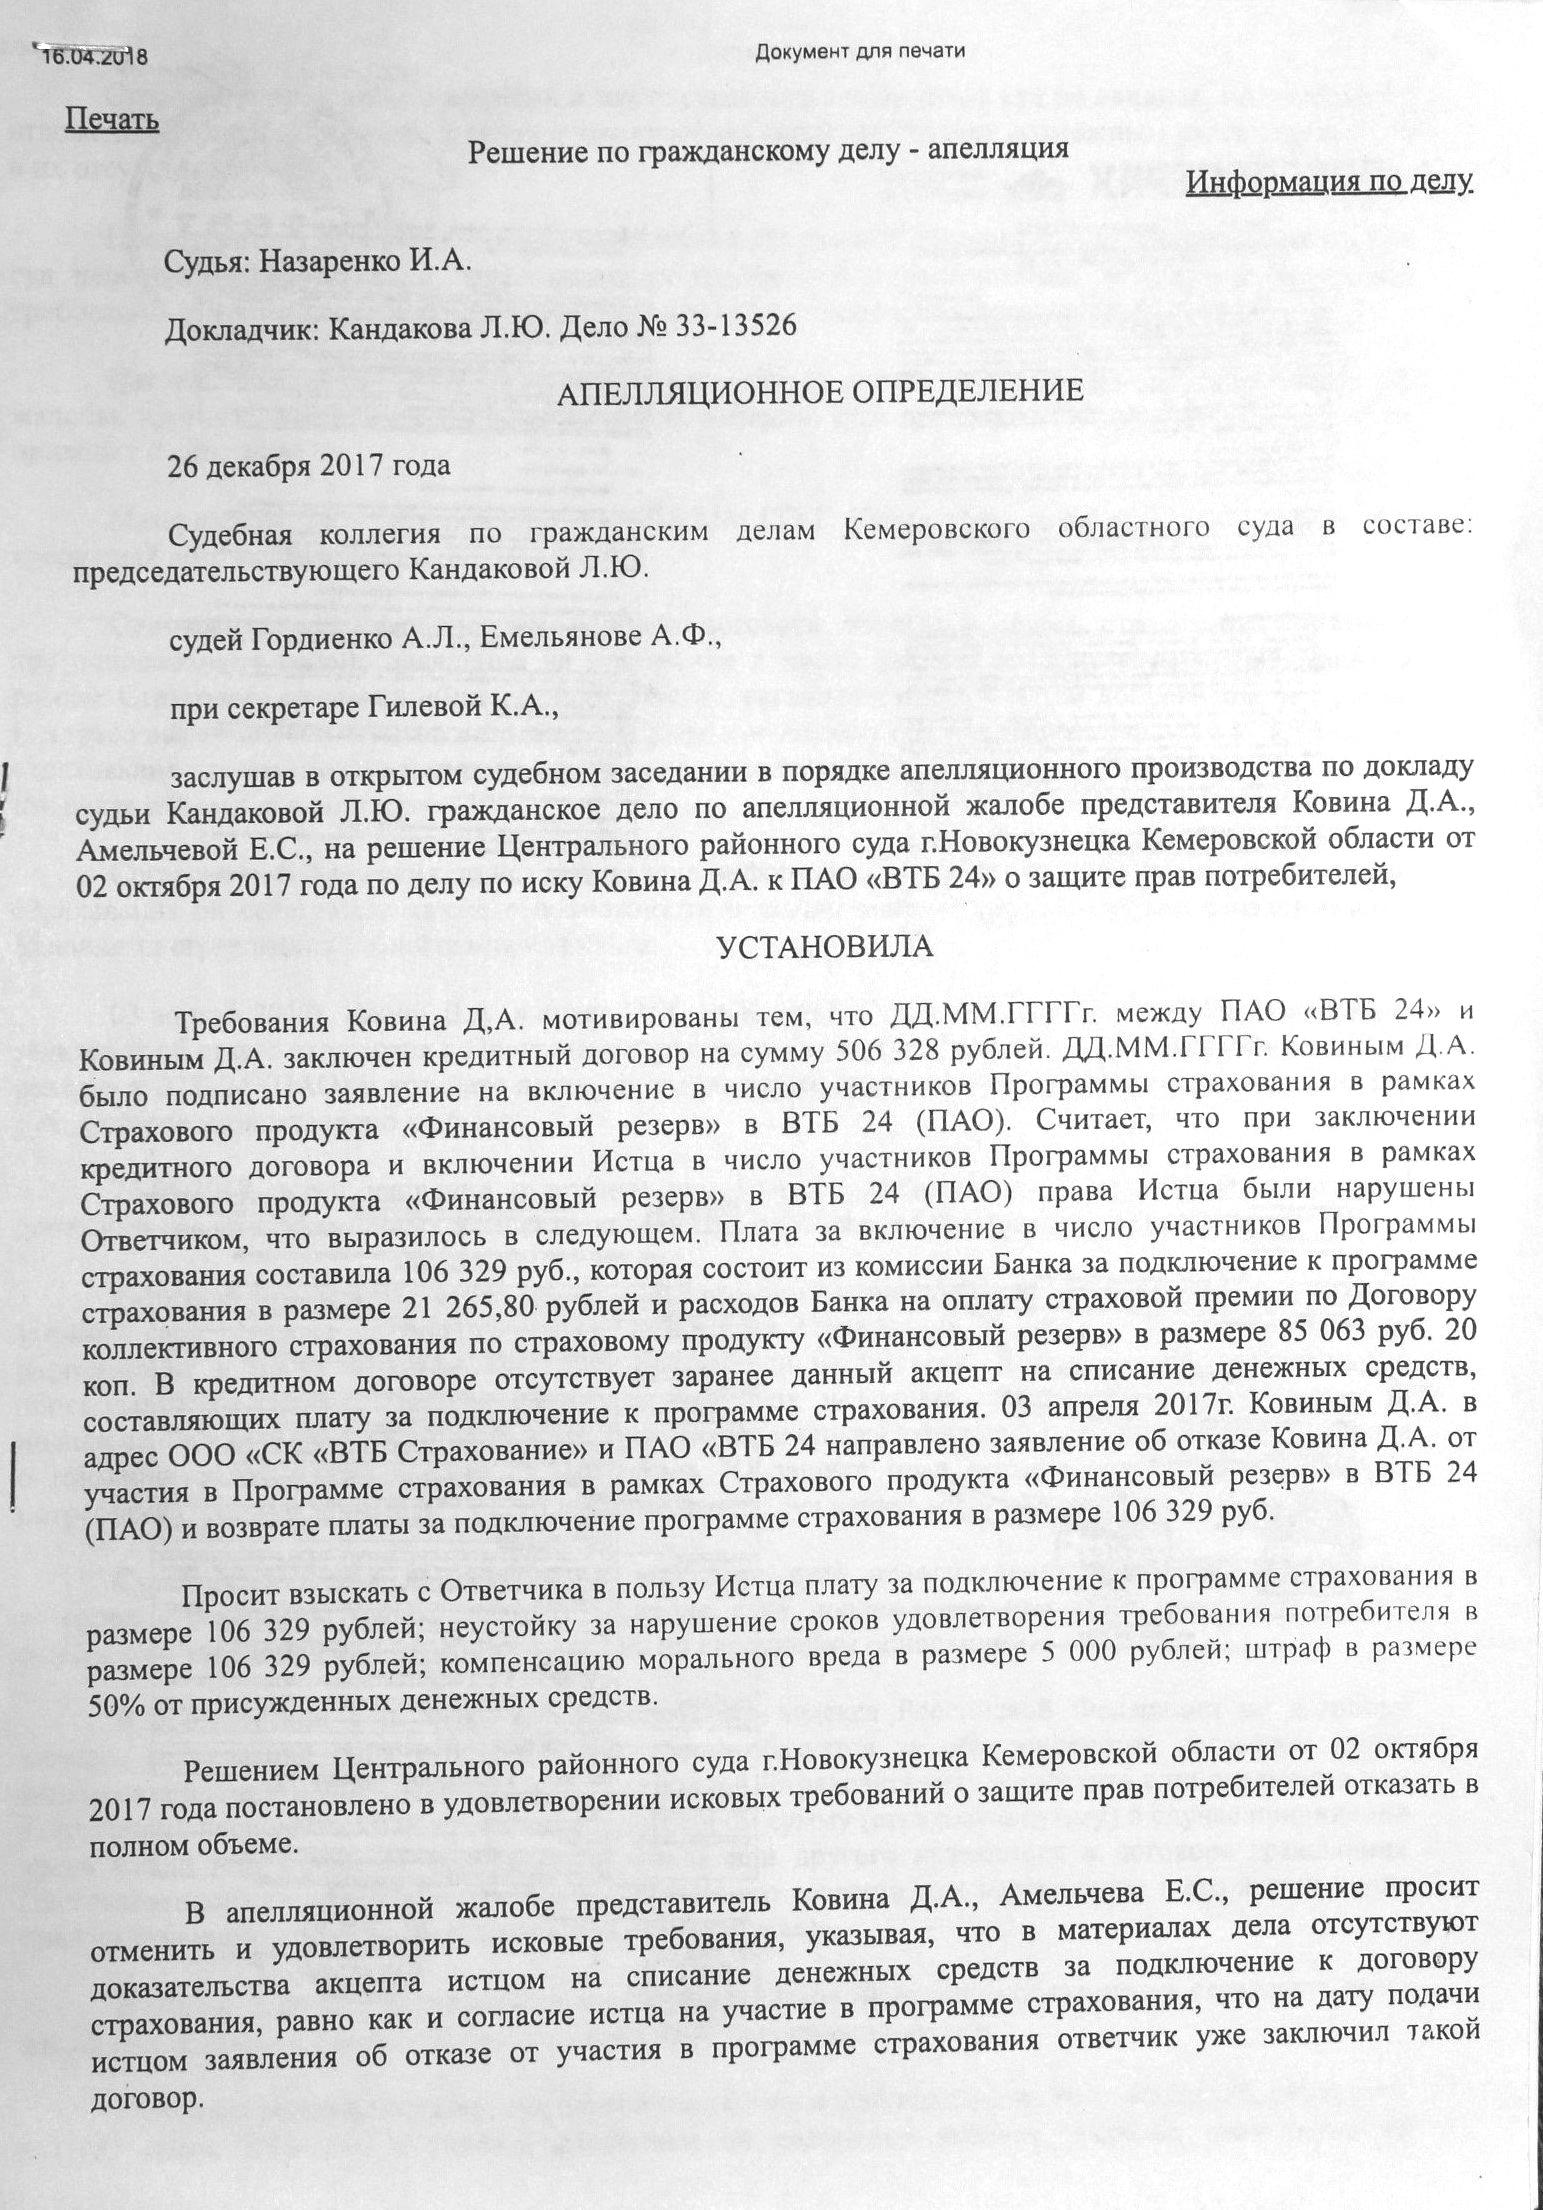 Решение по делу № 33-13526 от 26.12.2017 г.